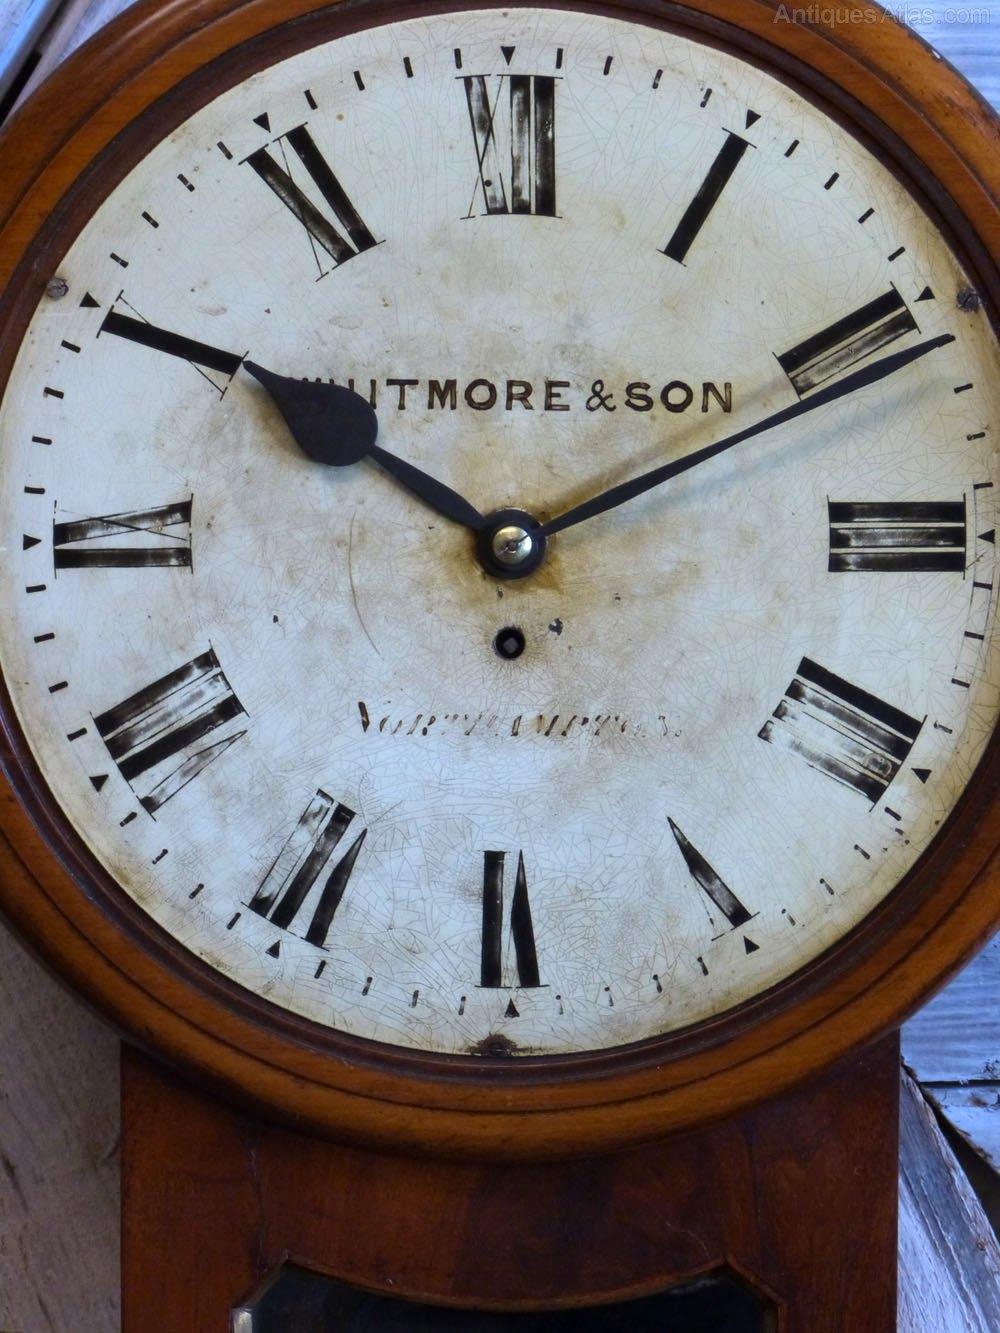 Antiques Atlas - Whitmore & Son Northampton Fusee Wall Clock